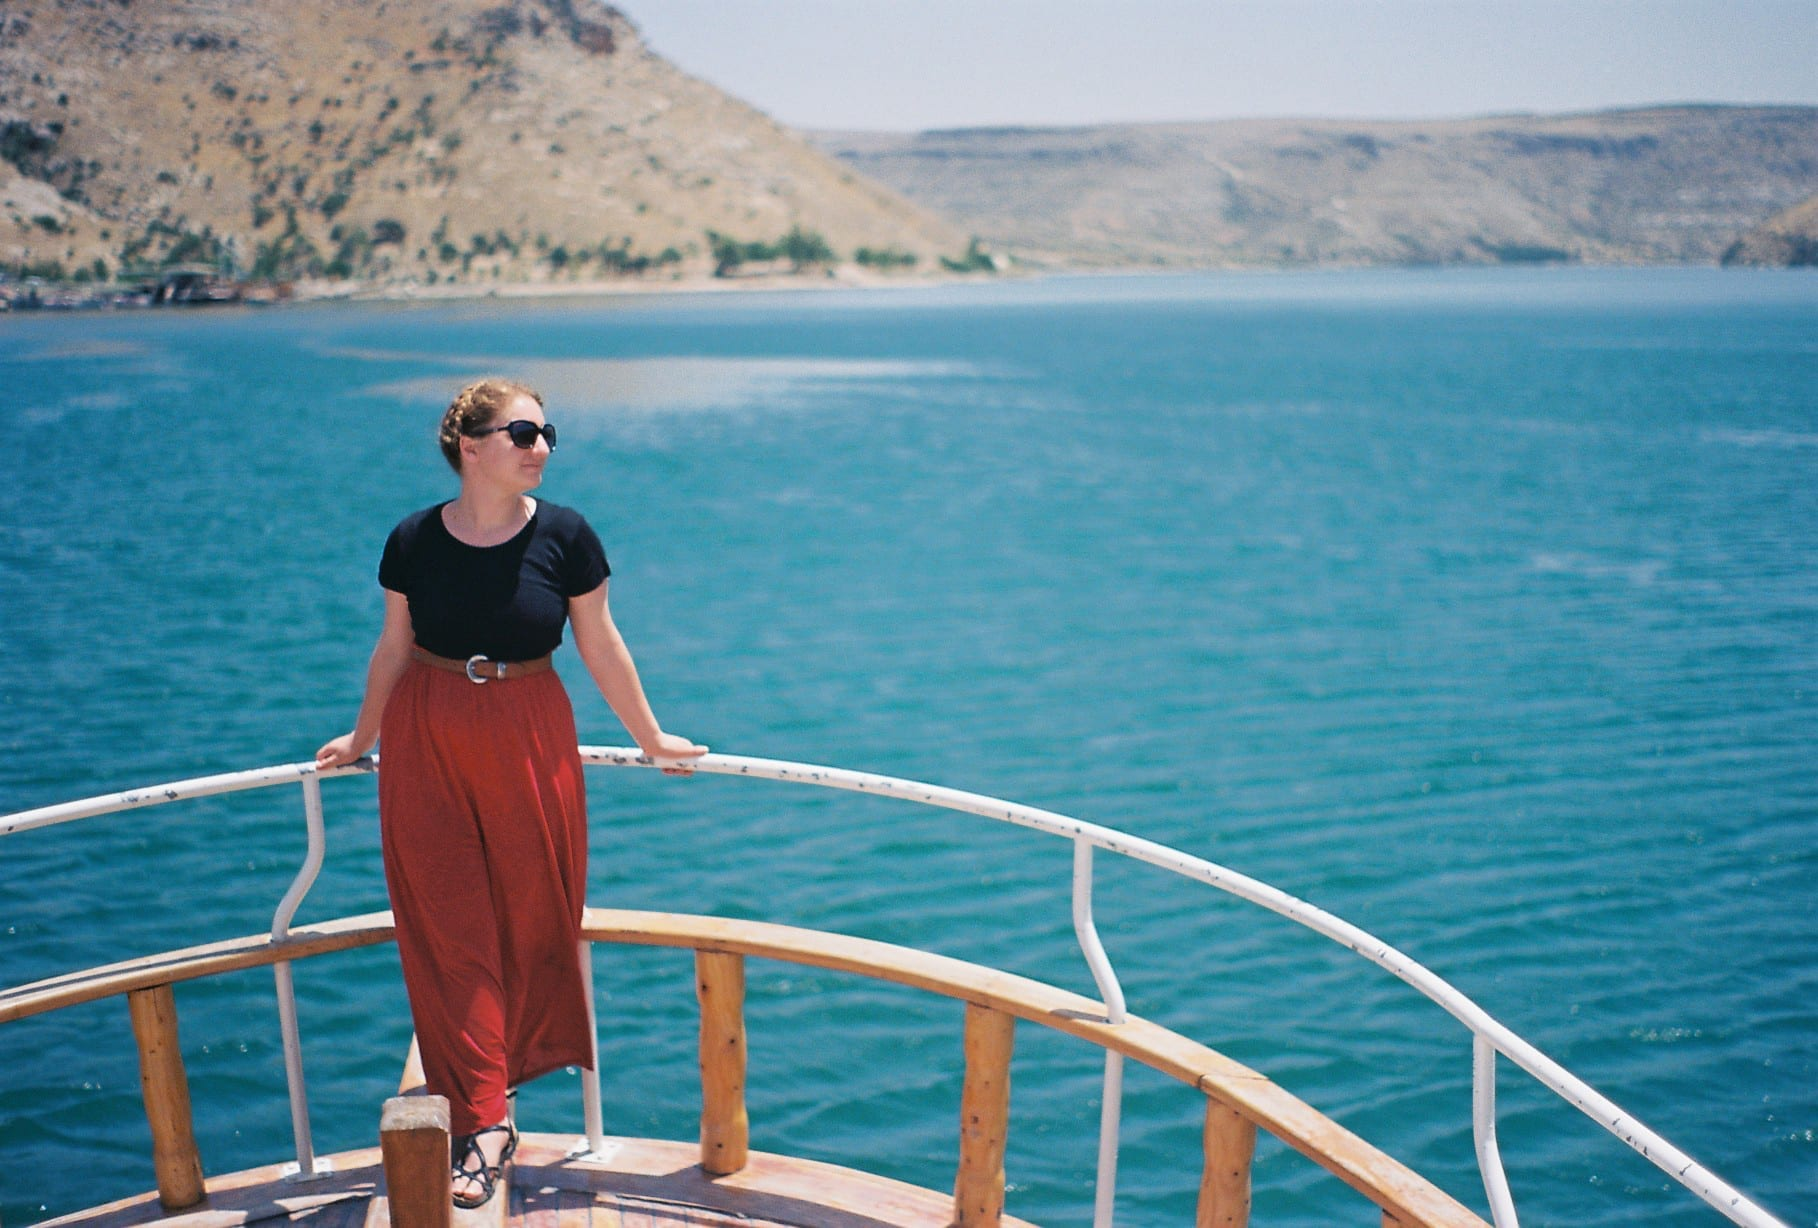 Solo Female Travel in Turkey — Is Turkey Safe?